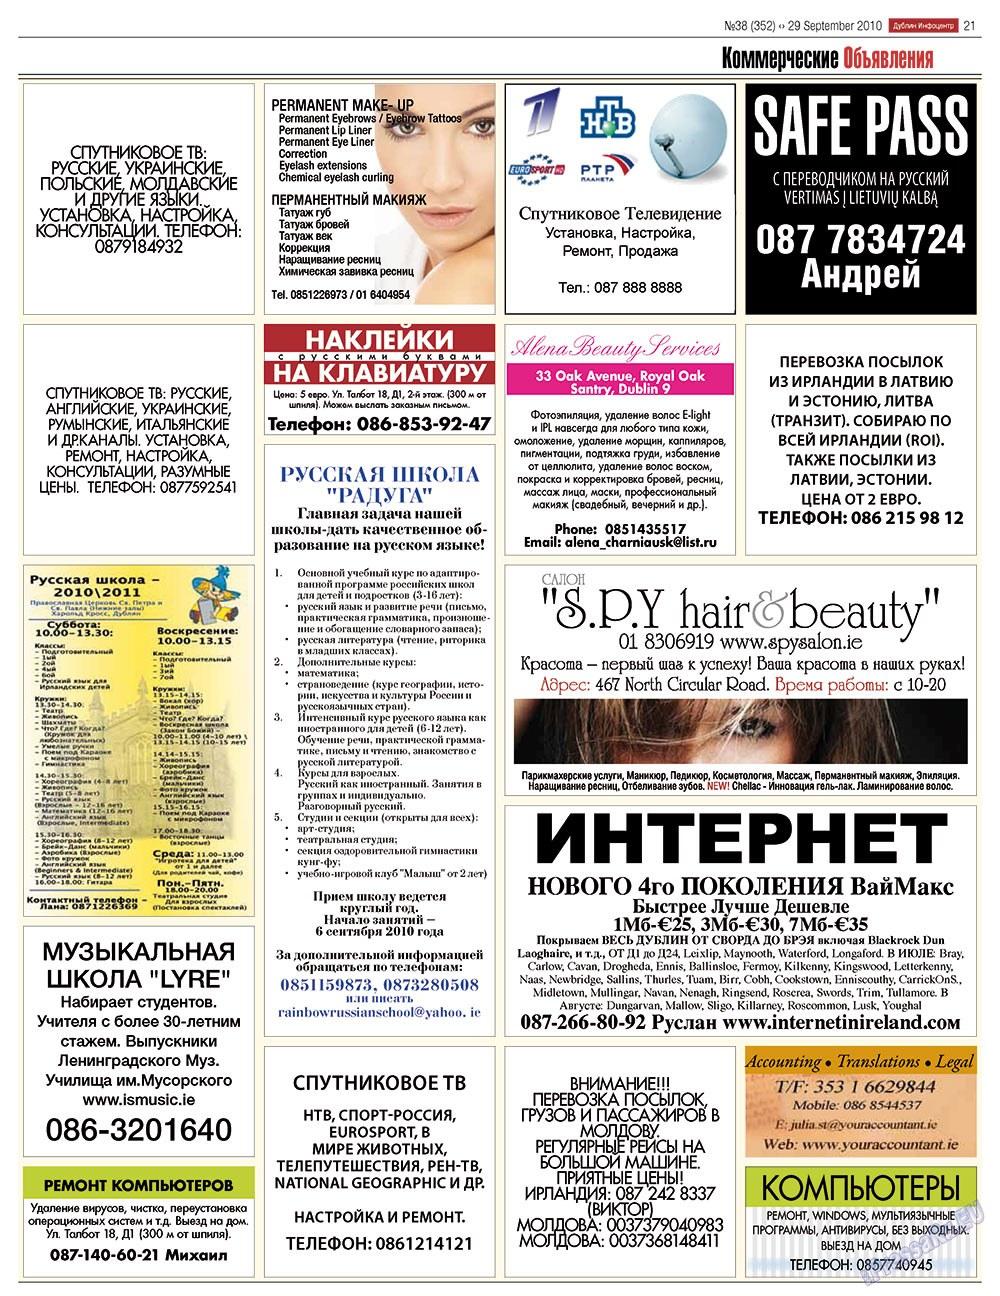 Дублин инфоцентр (газета). 2010 год, номер 38, стр. 21